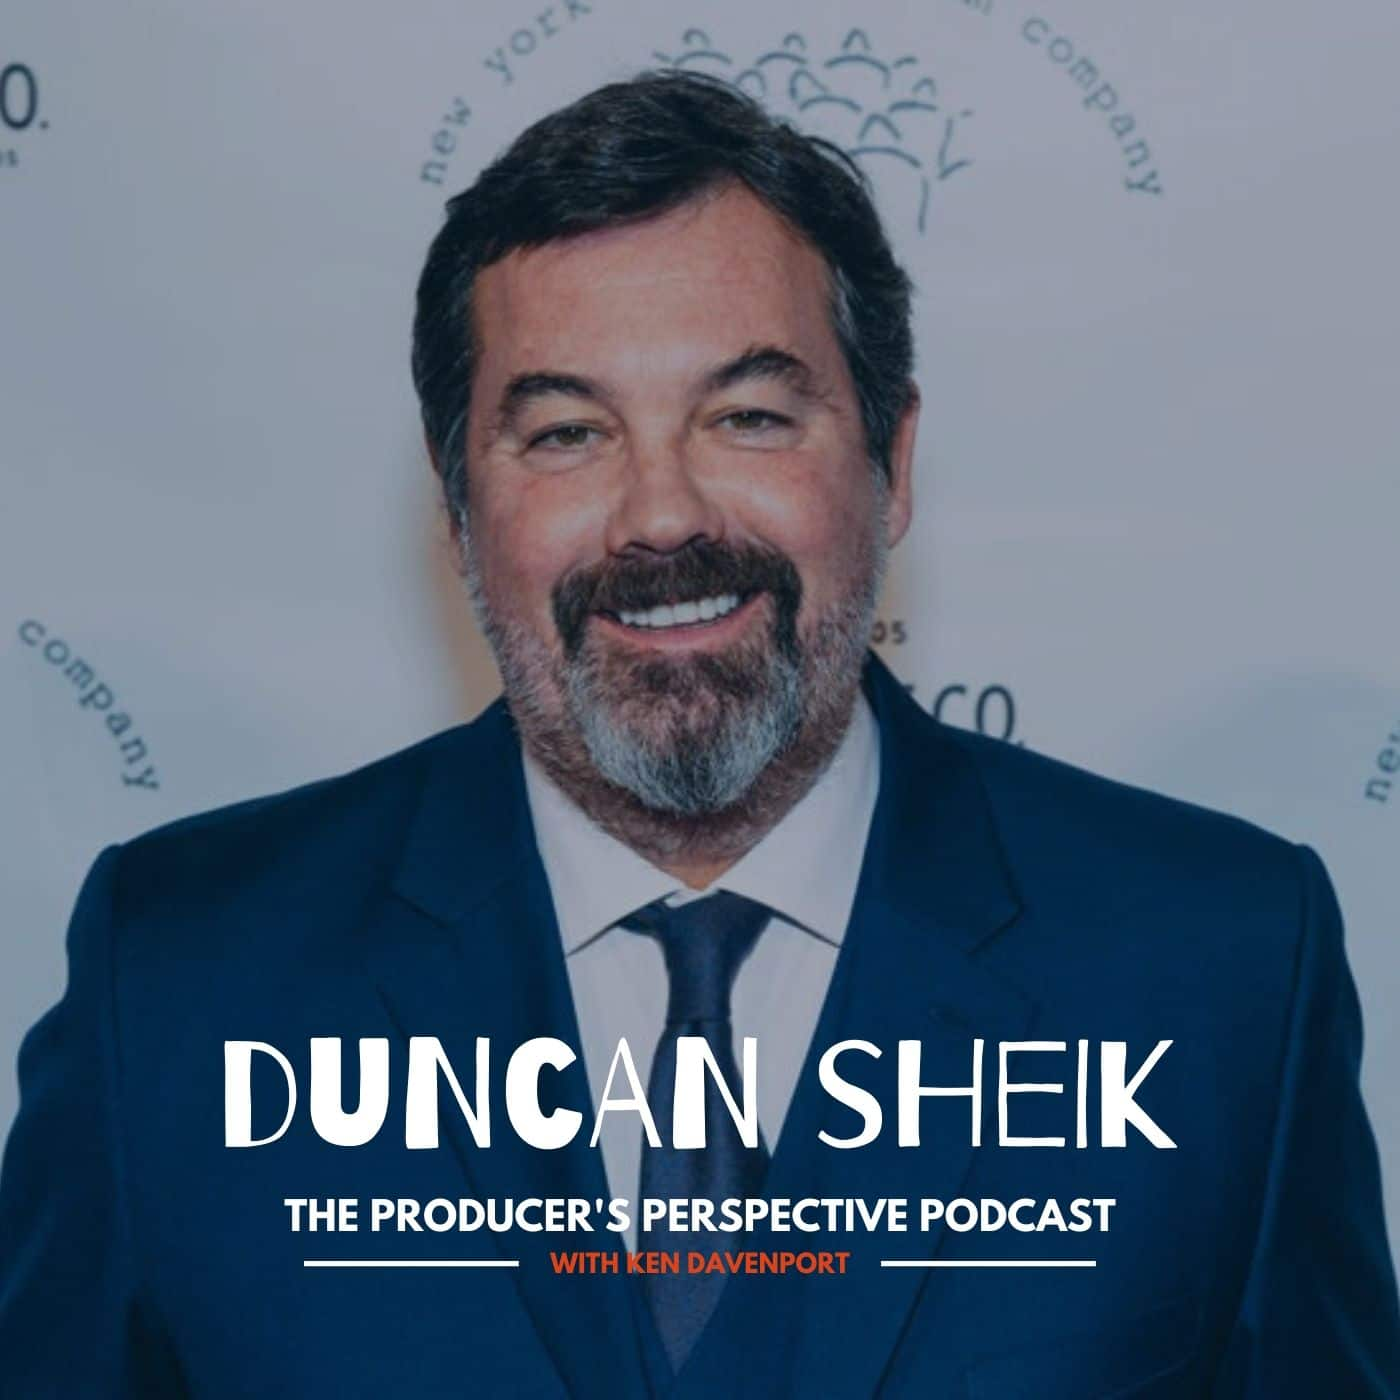 Ken Davenport's The Producer's Perspective Podcast Episode 38 - Duncan Sheik